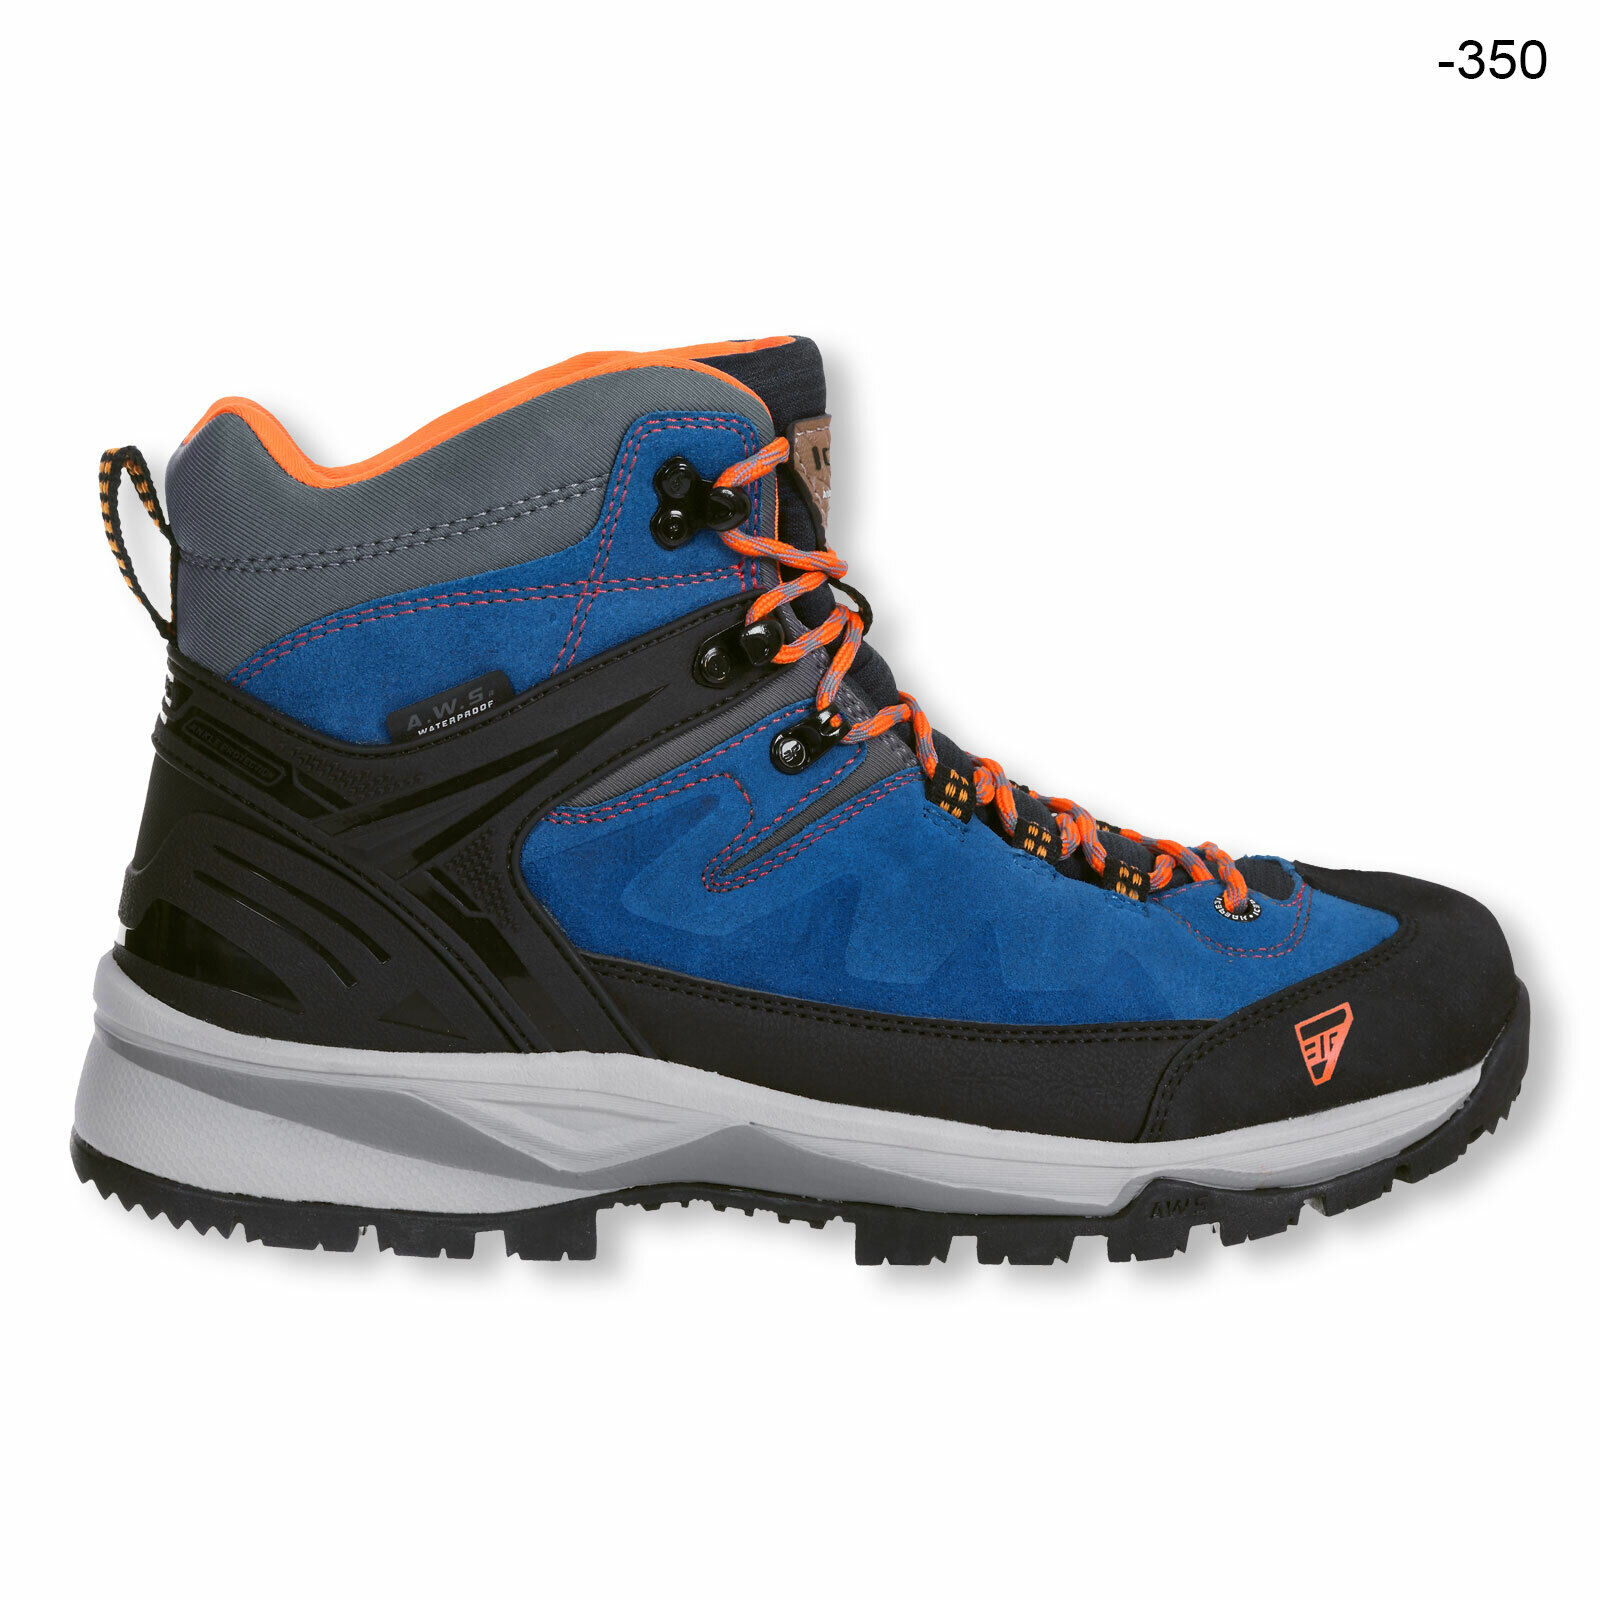 Icepeak Herren Trekking Outdoor Schuhe Wanderschuhe Wanderschuhe Wanderschuhe Wynne MR Waterproof Farbwahl 473e82